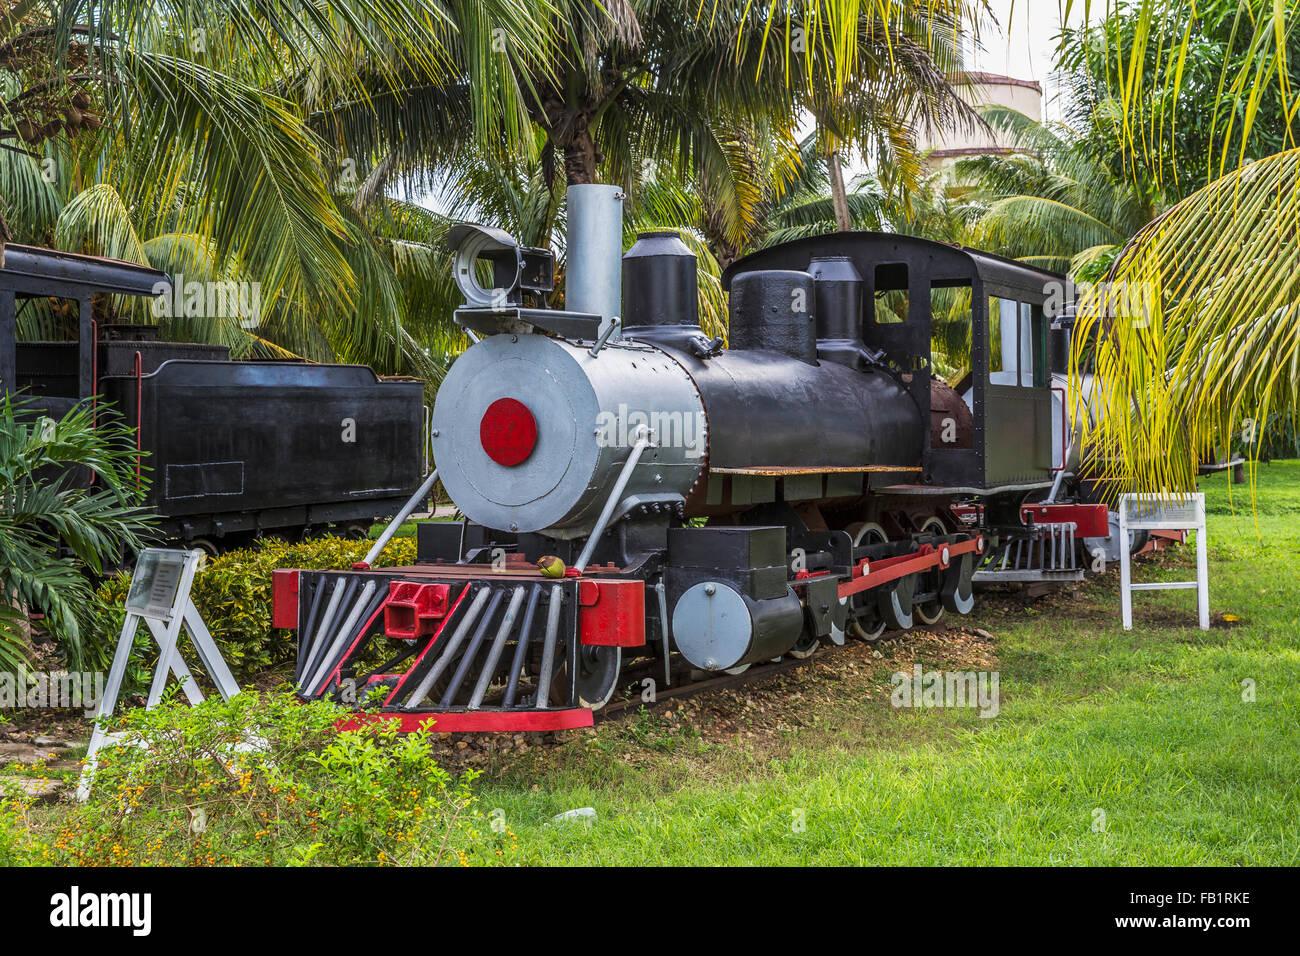 Nostalgischen Dampfloks, Marcelo Salado Zuckermuseum, Caibarién, Remedios, Kuba Stockbild